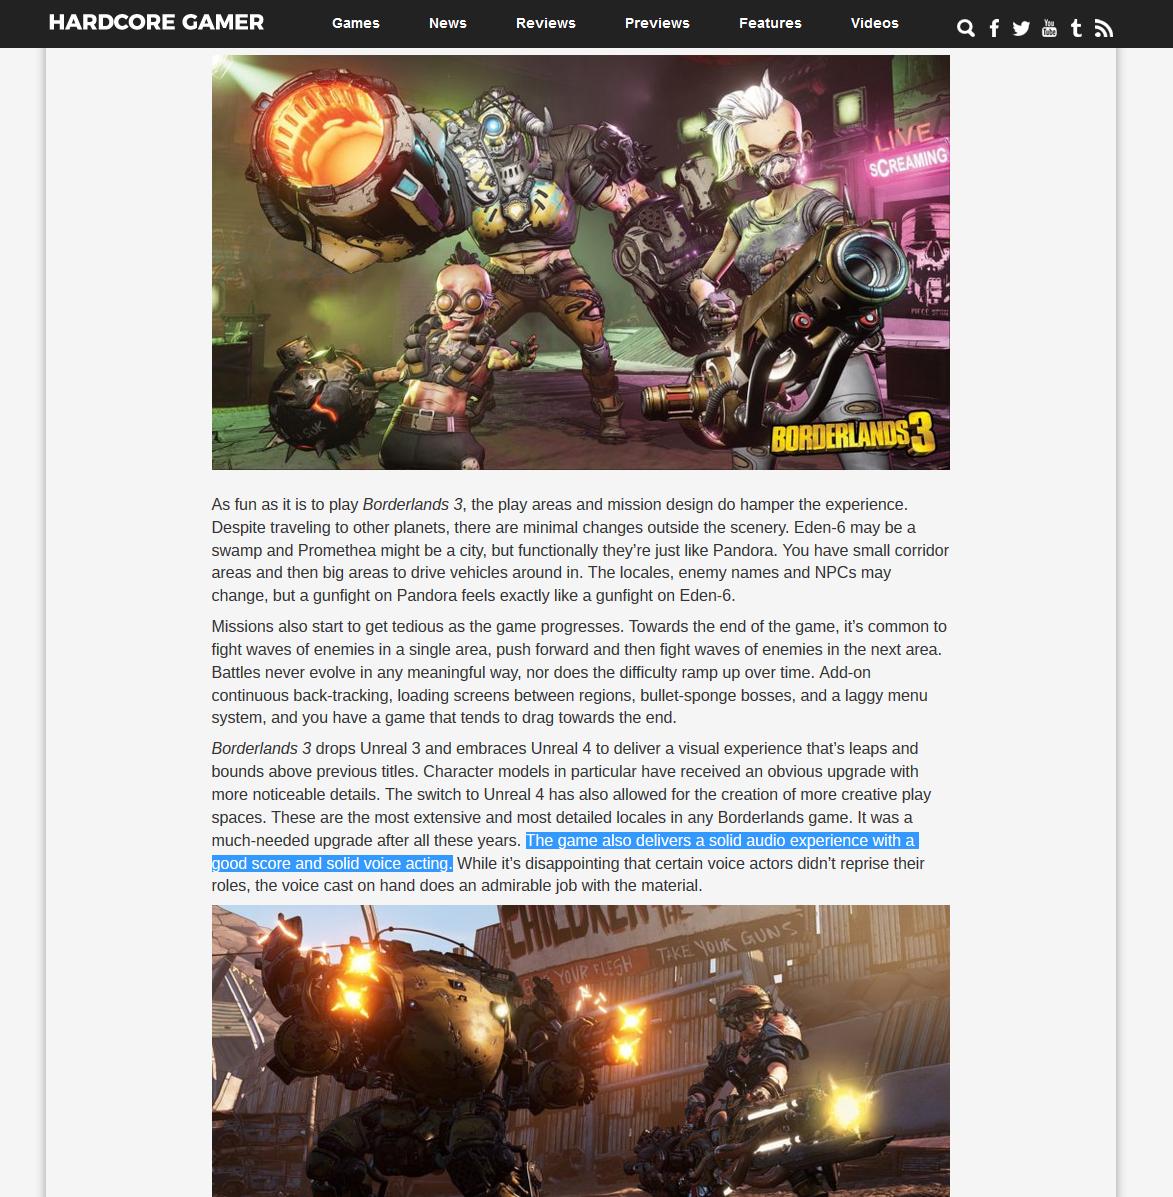 Review - Borderlands3_HardcoreGamer-Review_09.2019 Watson Wu.png